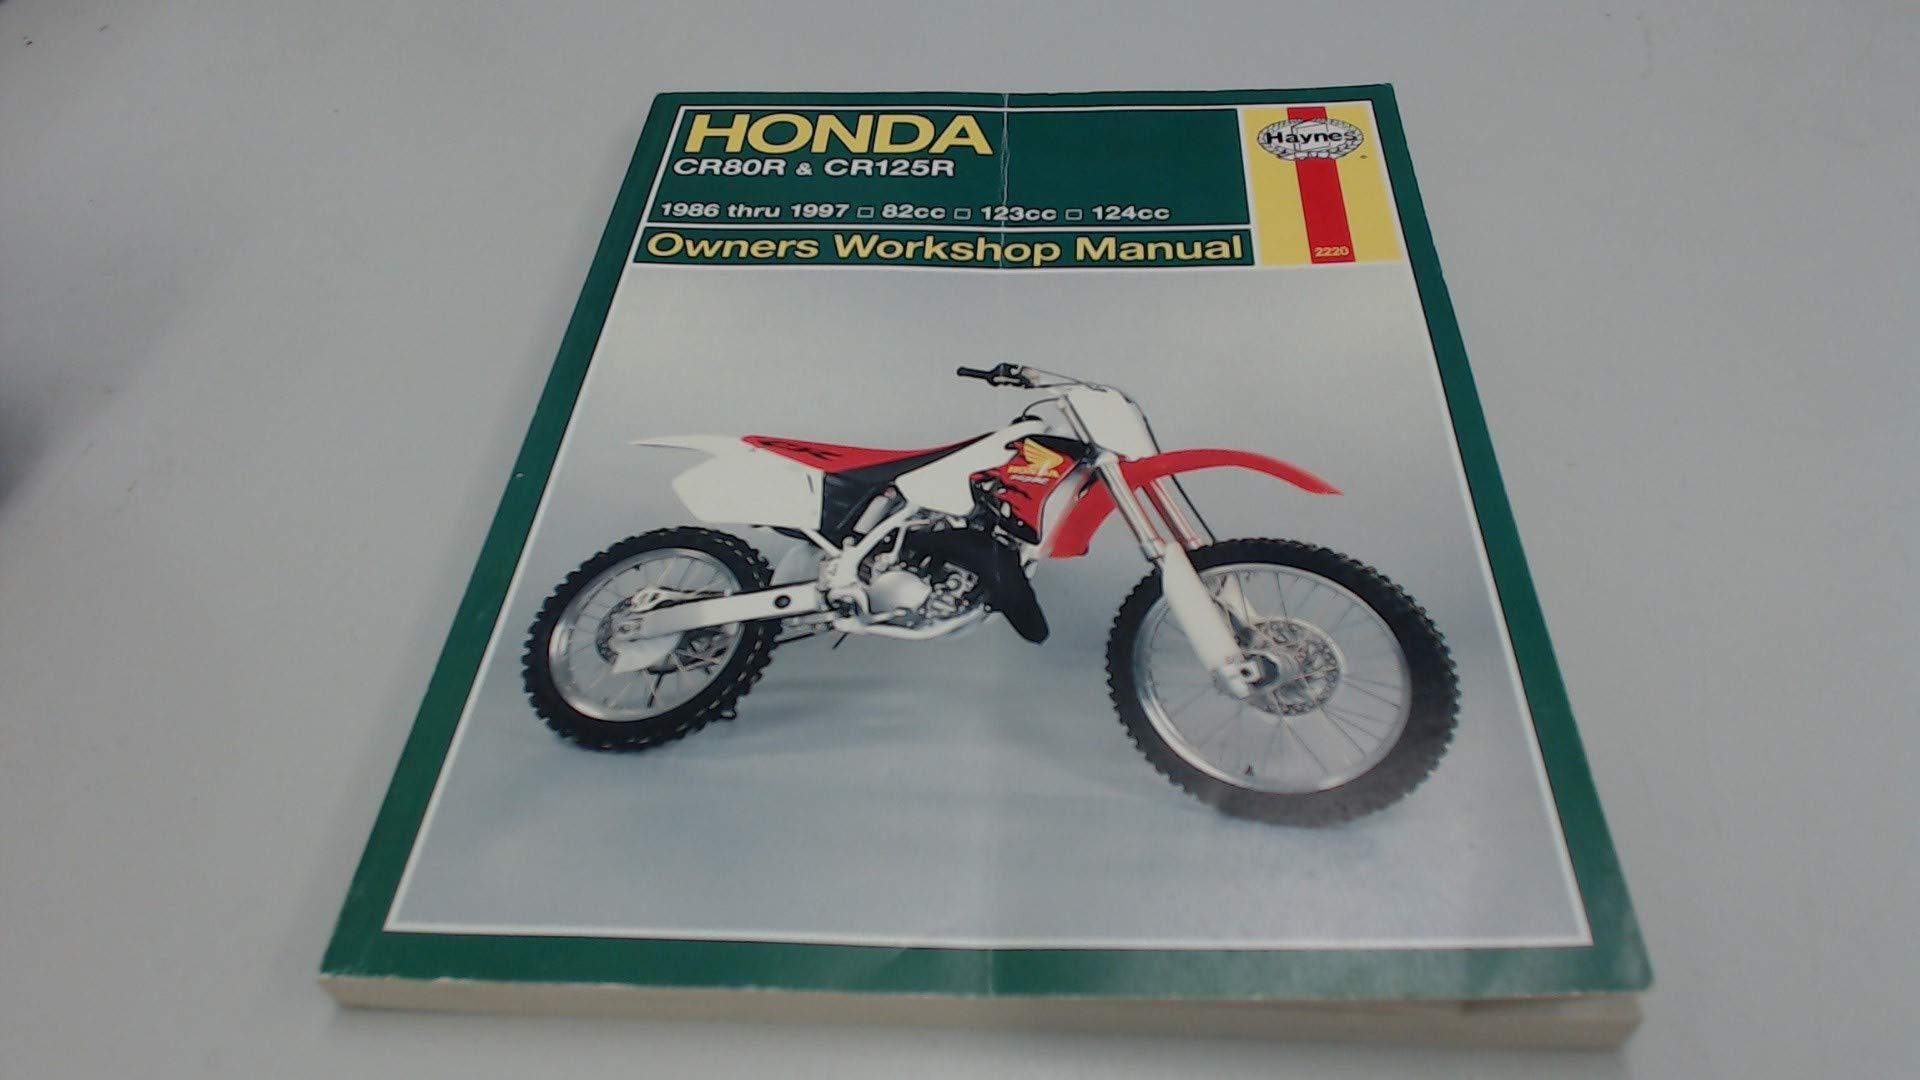 Buy Honda CR80 & CR125R (86-97) Service & Repair Manual (Haynes service &  repair manual series) Book Online at Low Prices in India | Honda CR80 &  CR125R ...